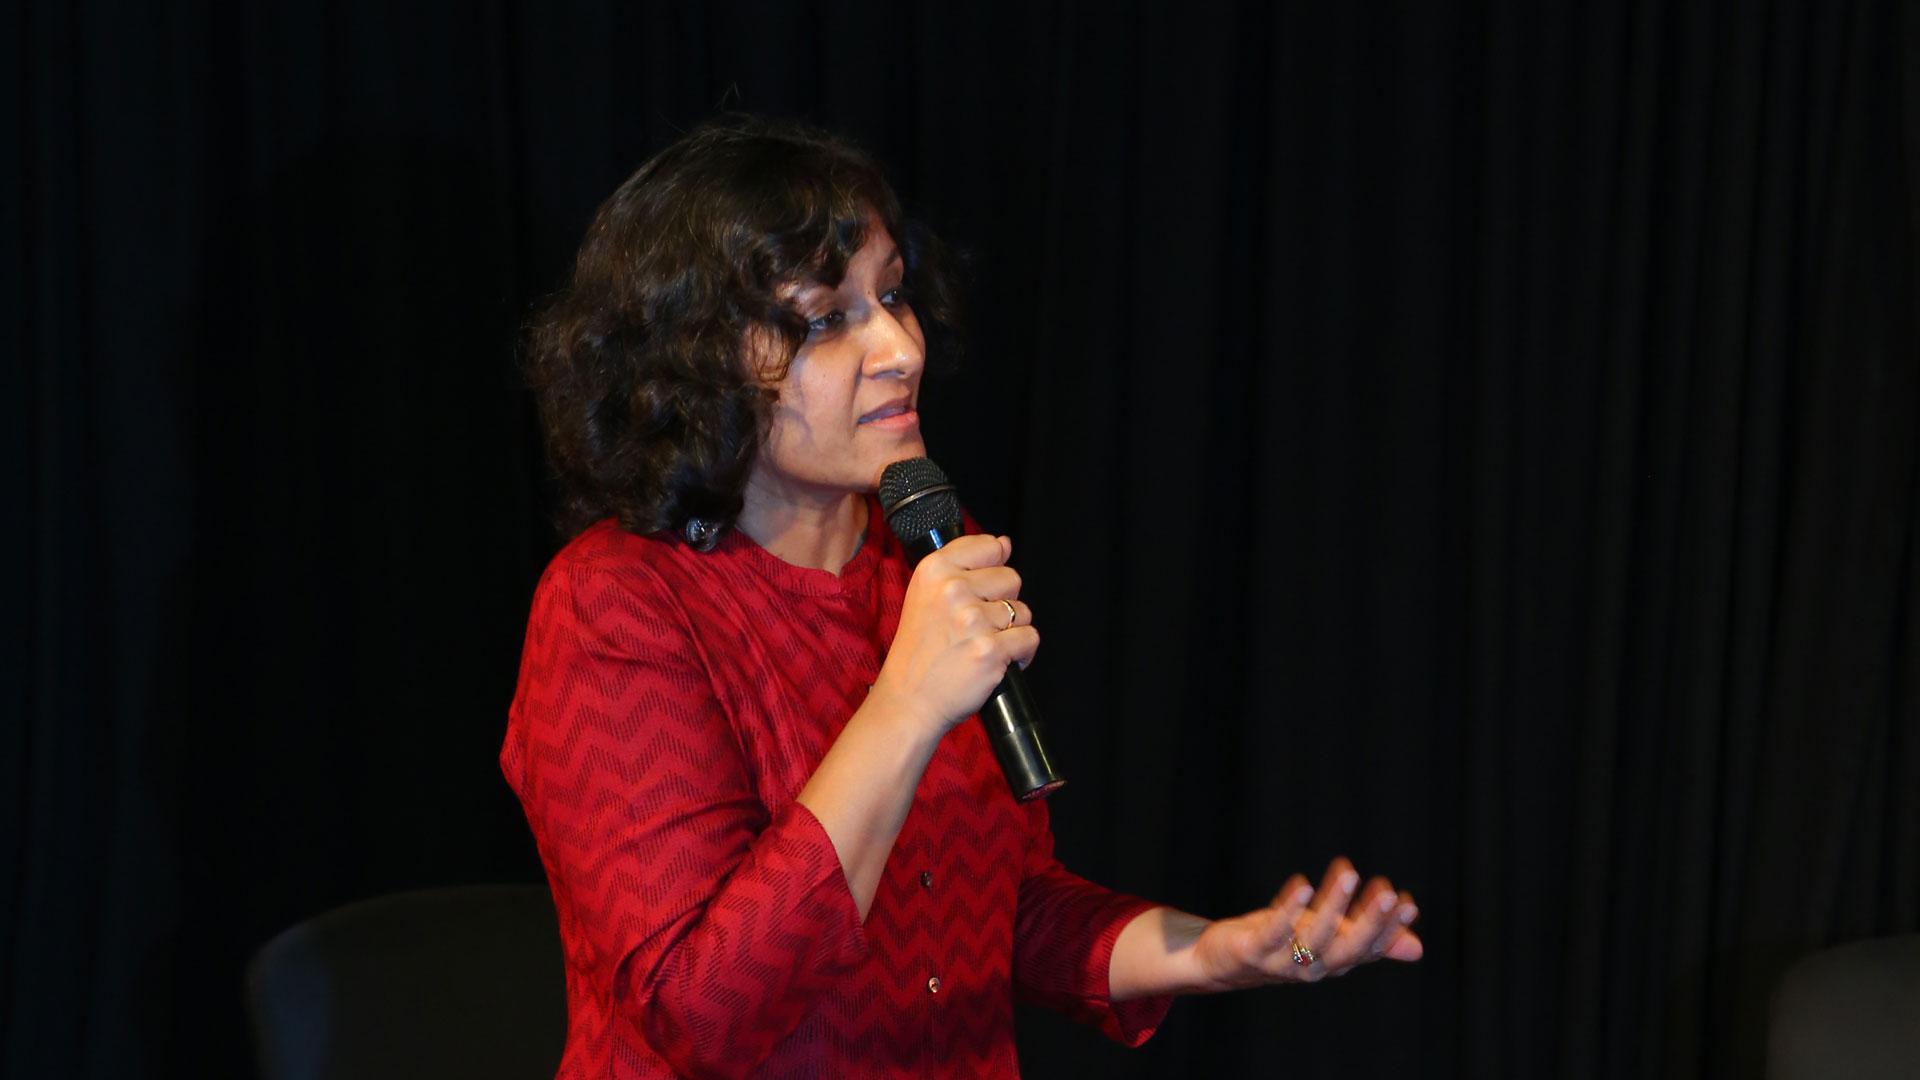 VK-Karthika-2nd-Attic-Lecture-Anitas-Attic-Convocation-Sep-2017